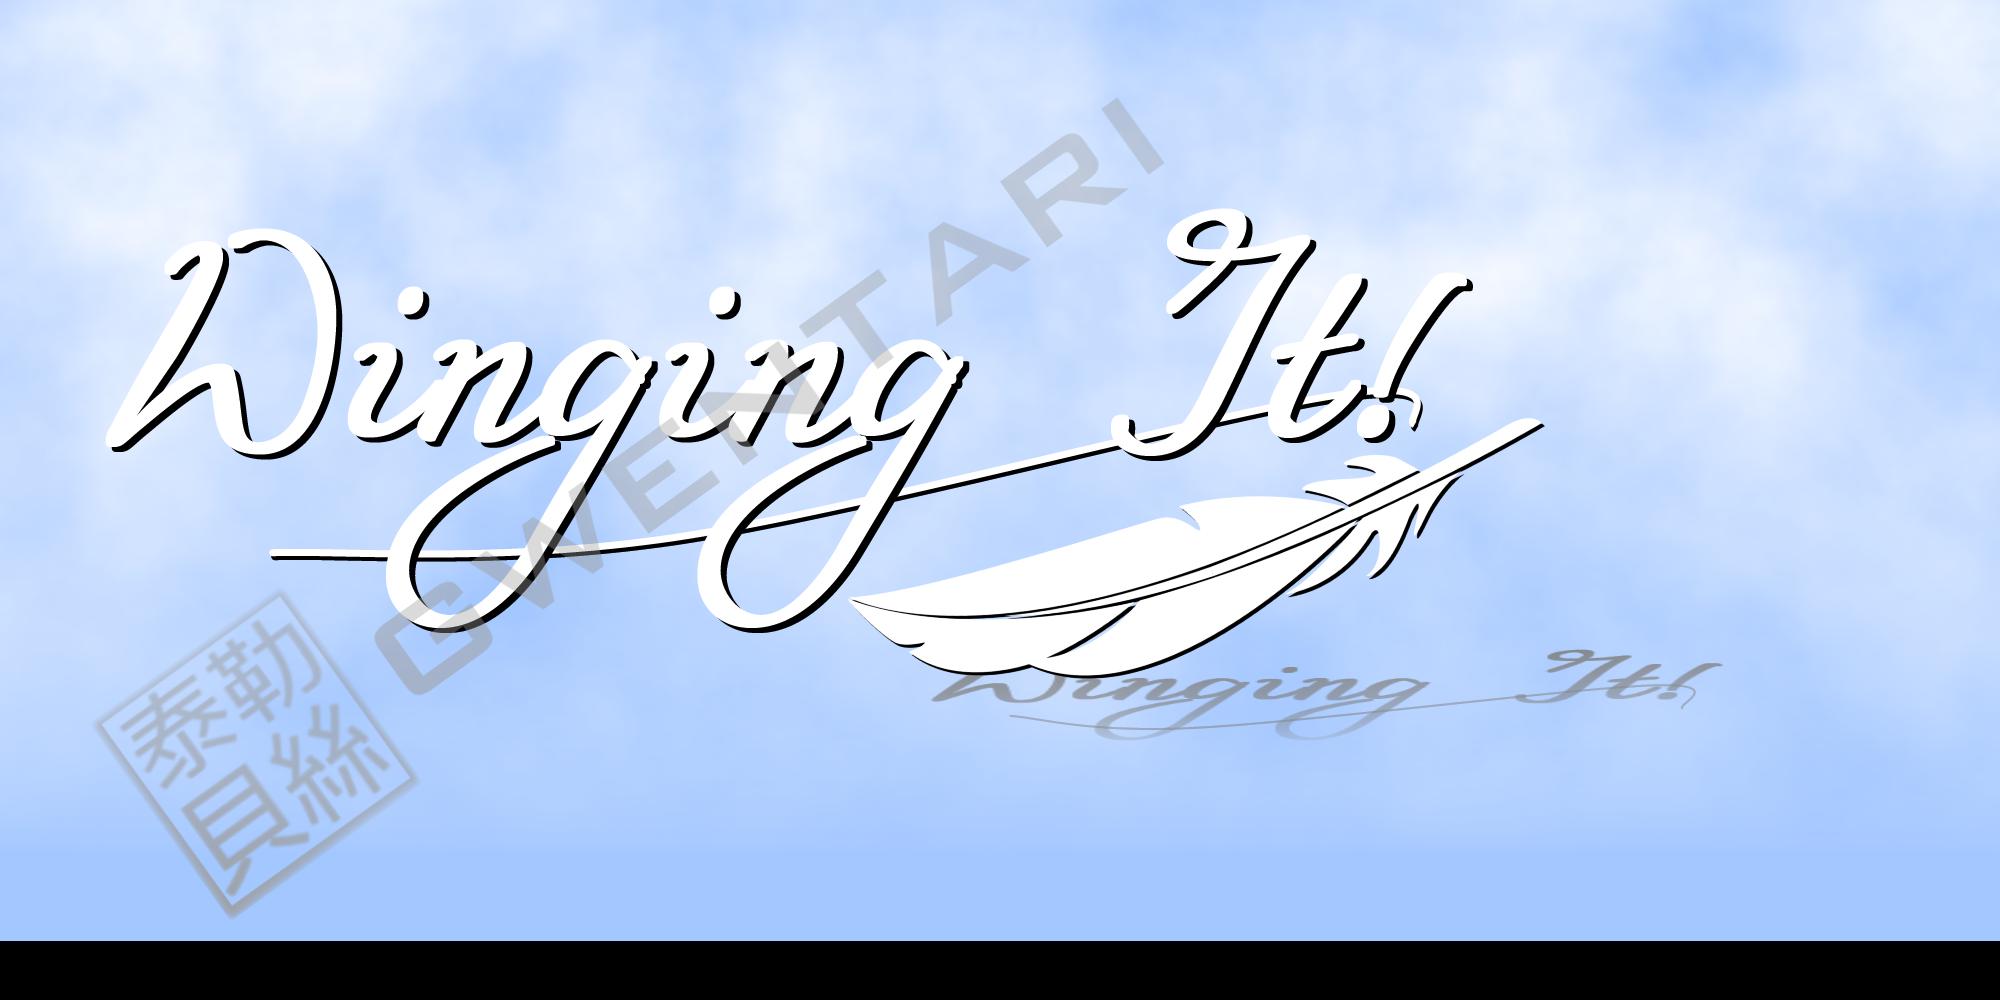 Winging It! by Gwentari